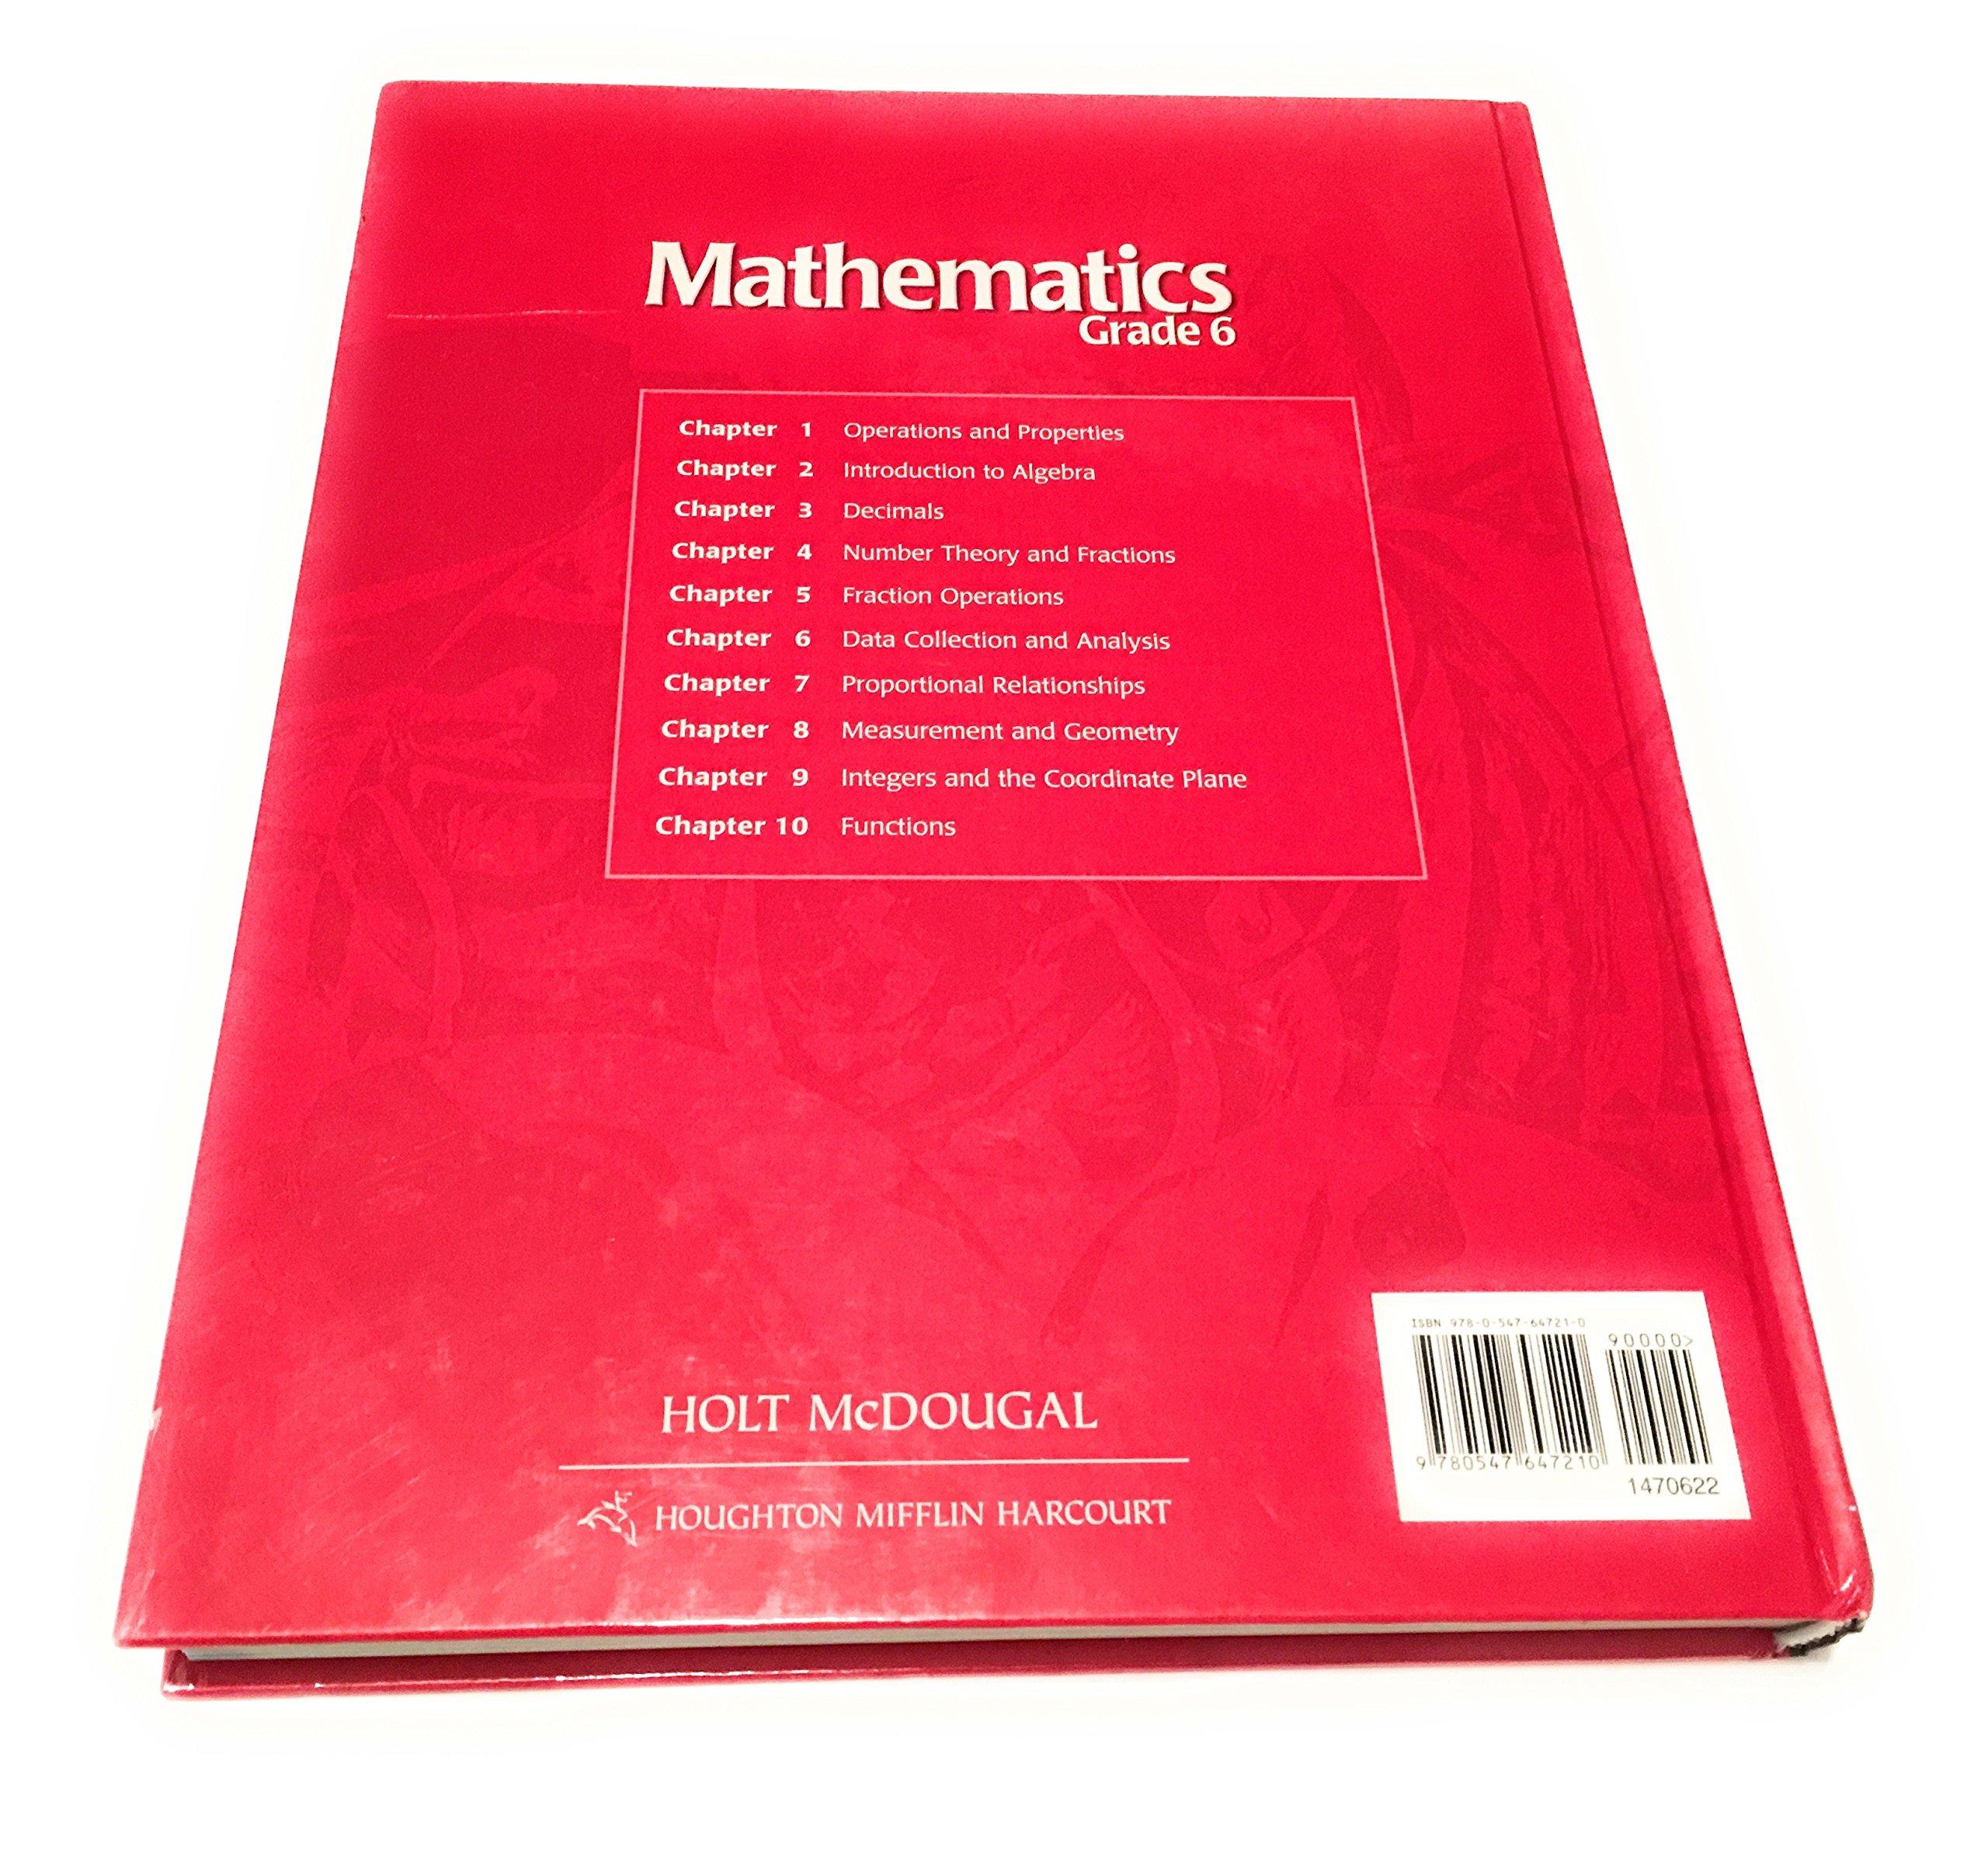 Holt McDougal Mathematics: Teacher's Edition Grade 6 2012: Amazon co